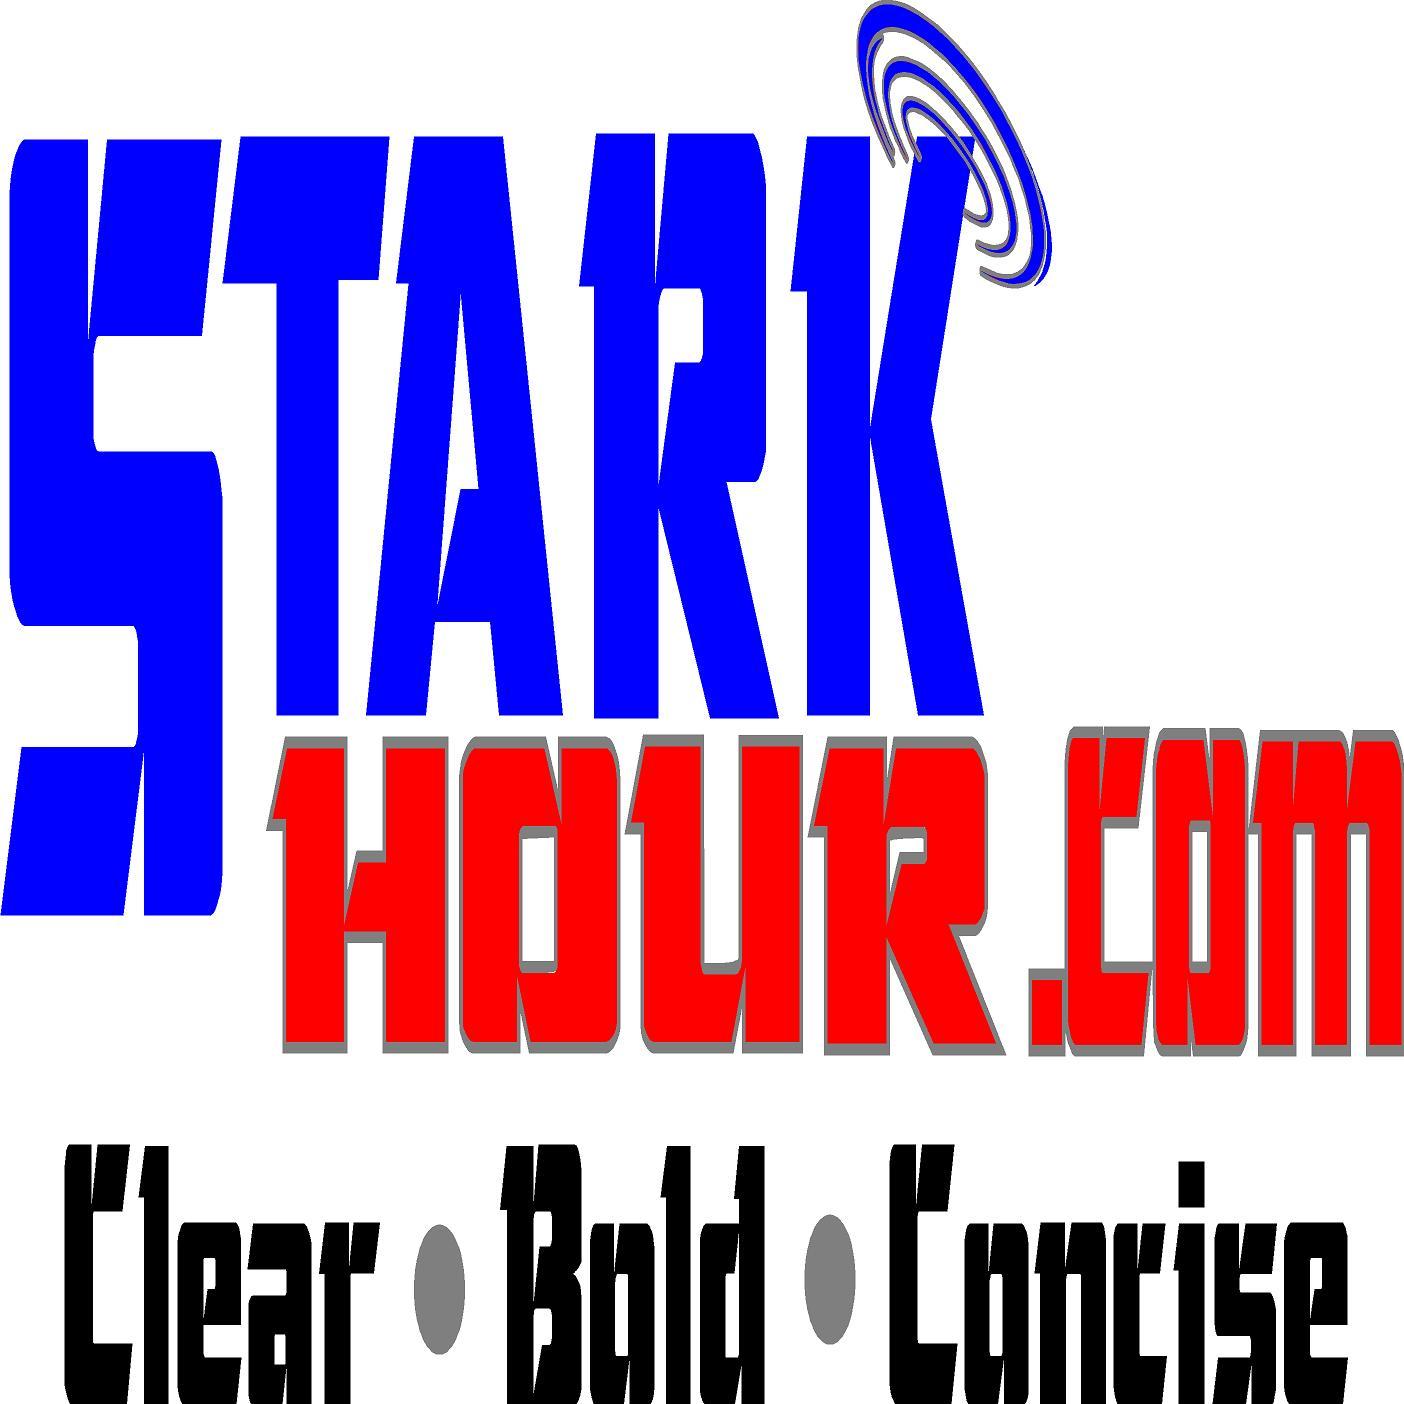 StarkHour.com